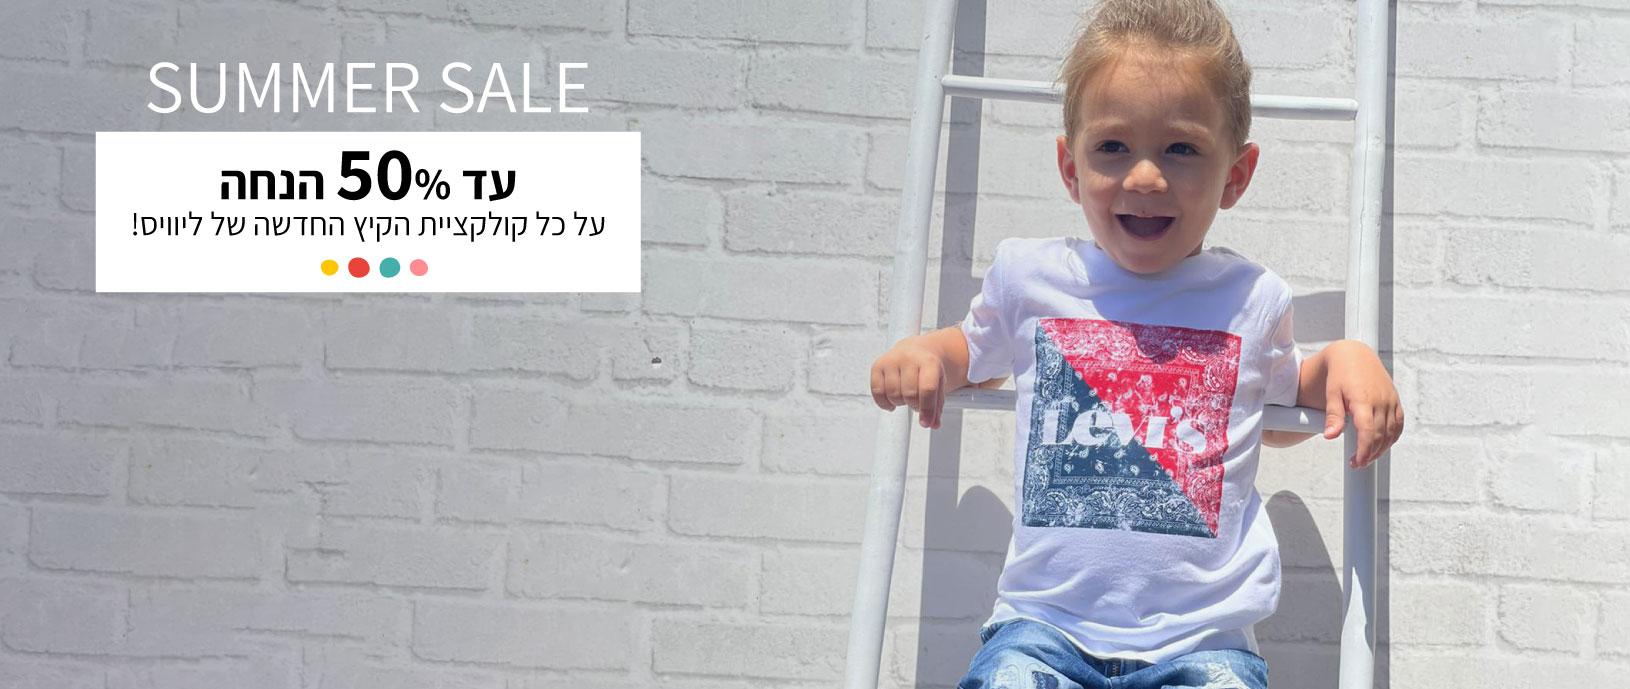 בגדי ילדים ליוויס באבלס אונליין